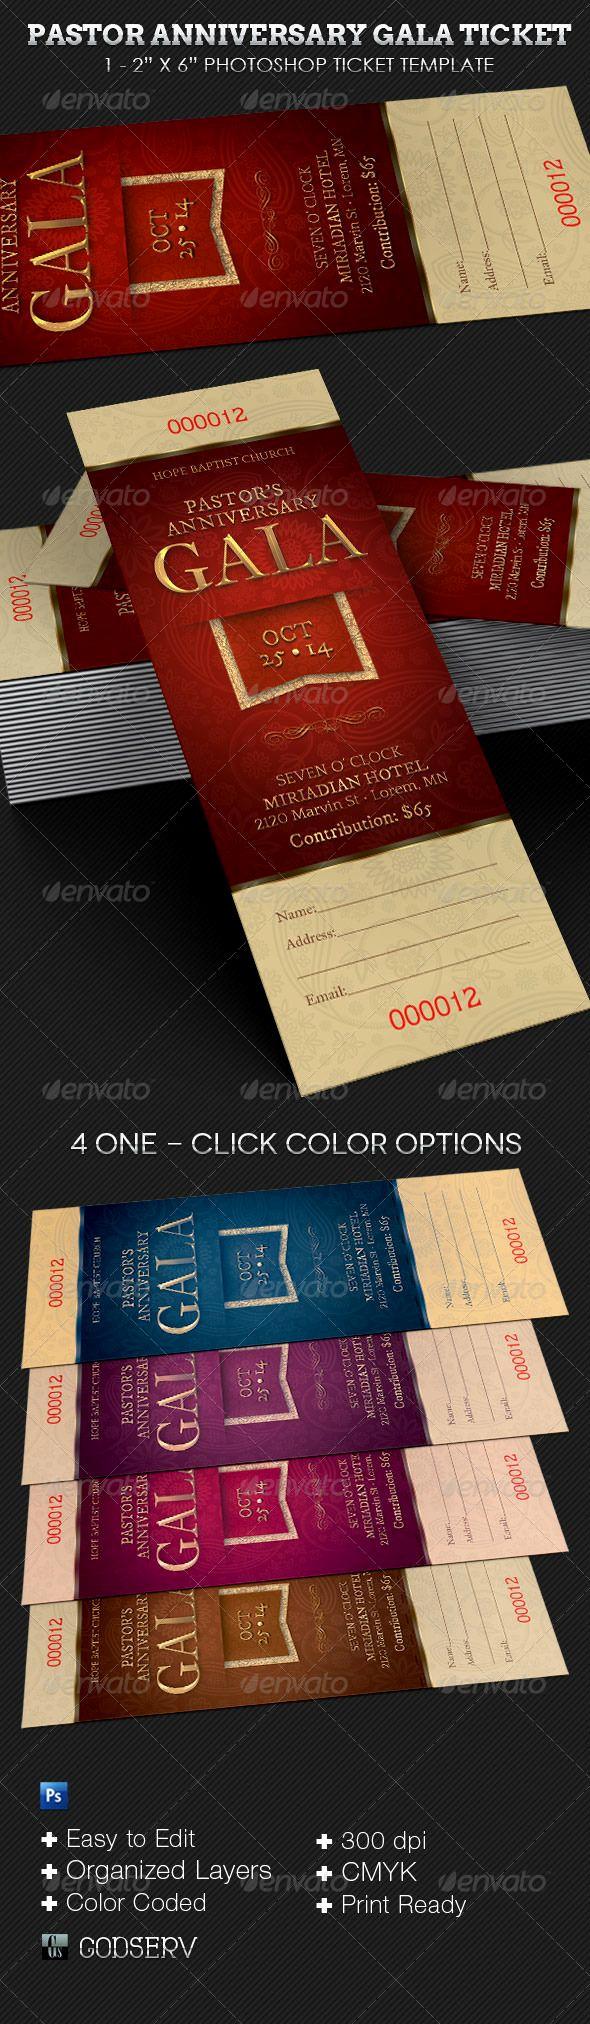 Pastor Anniversary Invitation Letter Inspirational Pastor Anniversary Gala Ticket Template Pastor